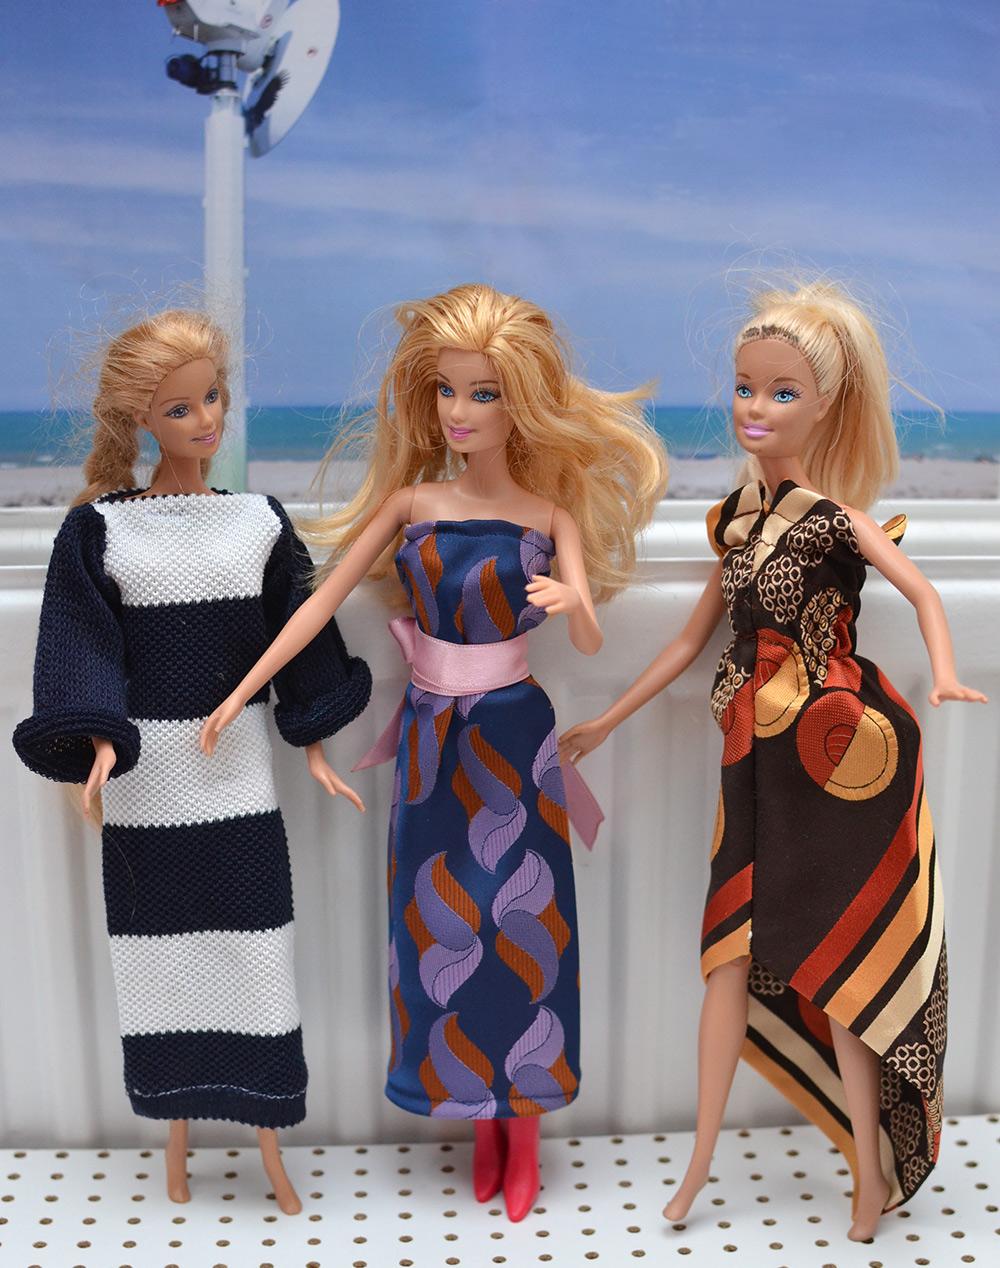 Upcycling-Barbiekleid aus Krawatte, Puppenkleid fast ohne Nähen